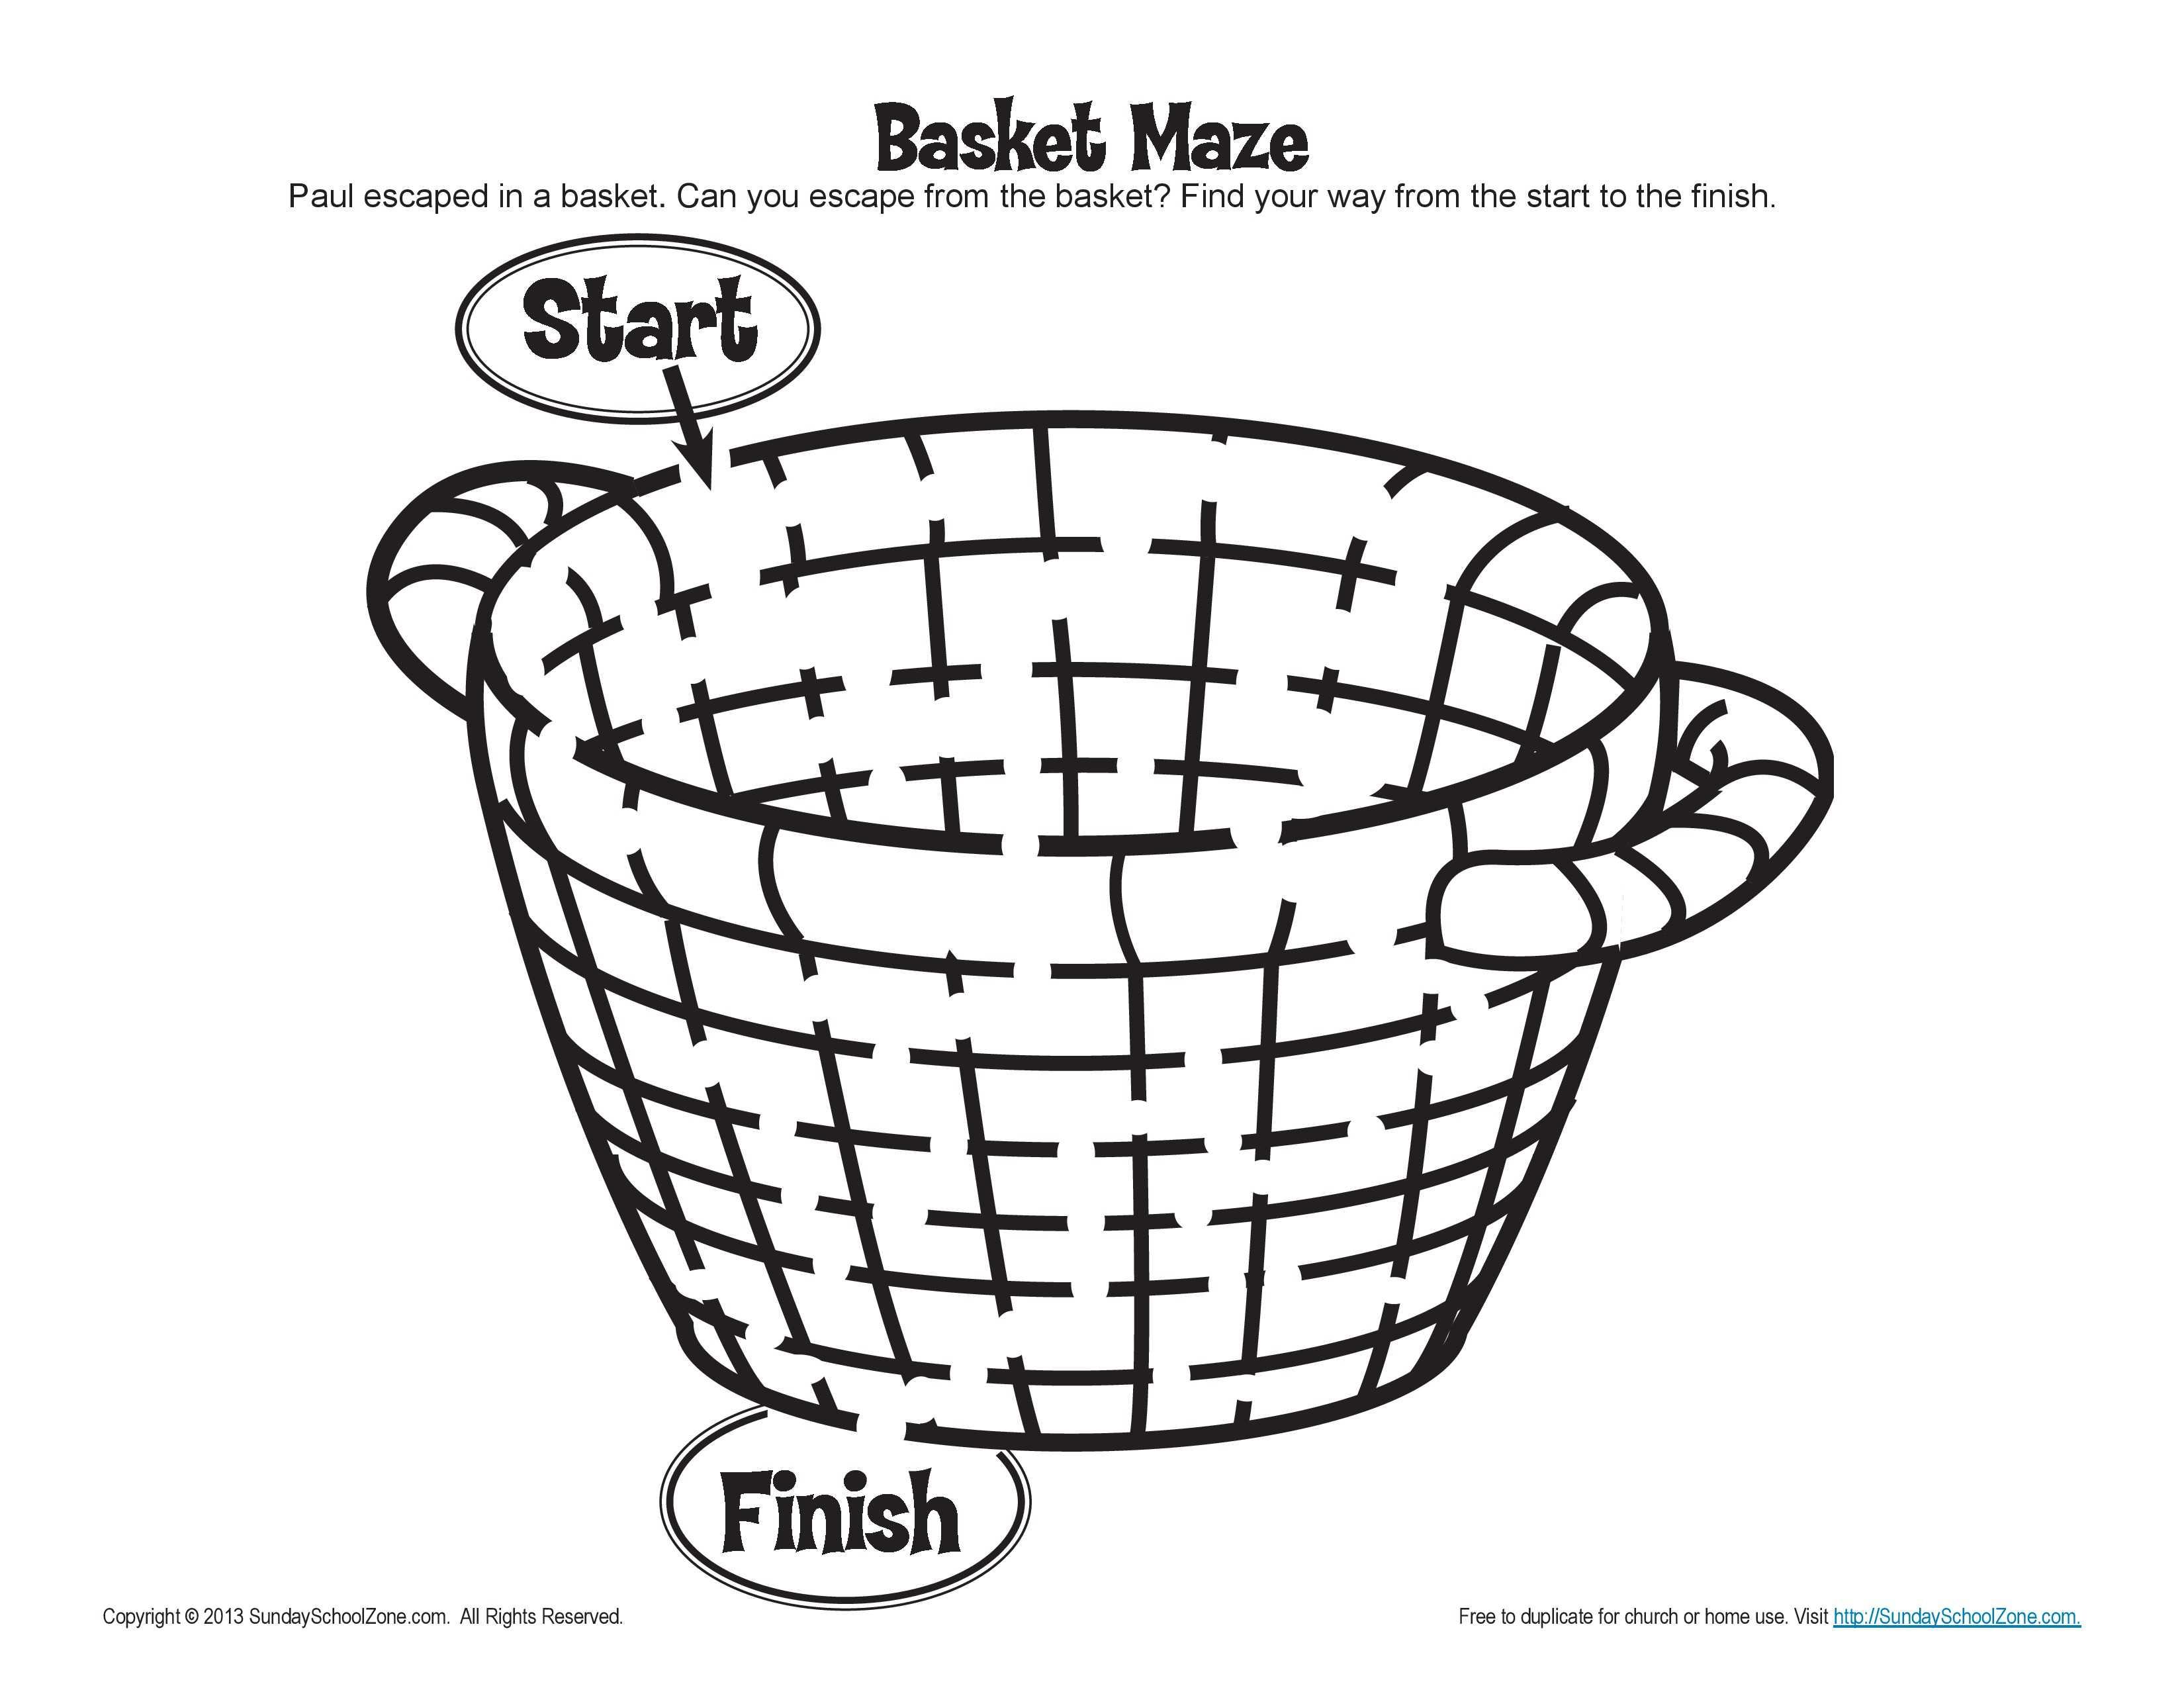 Paul Escaped Damascus In A Basket Maze